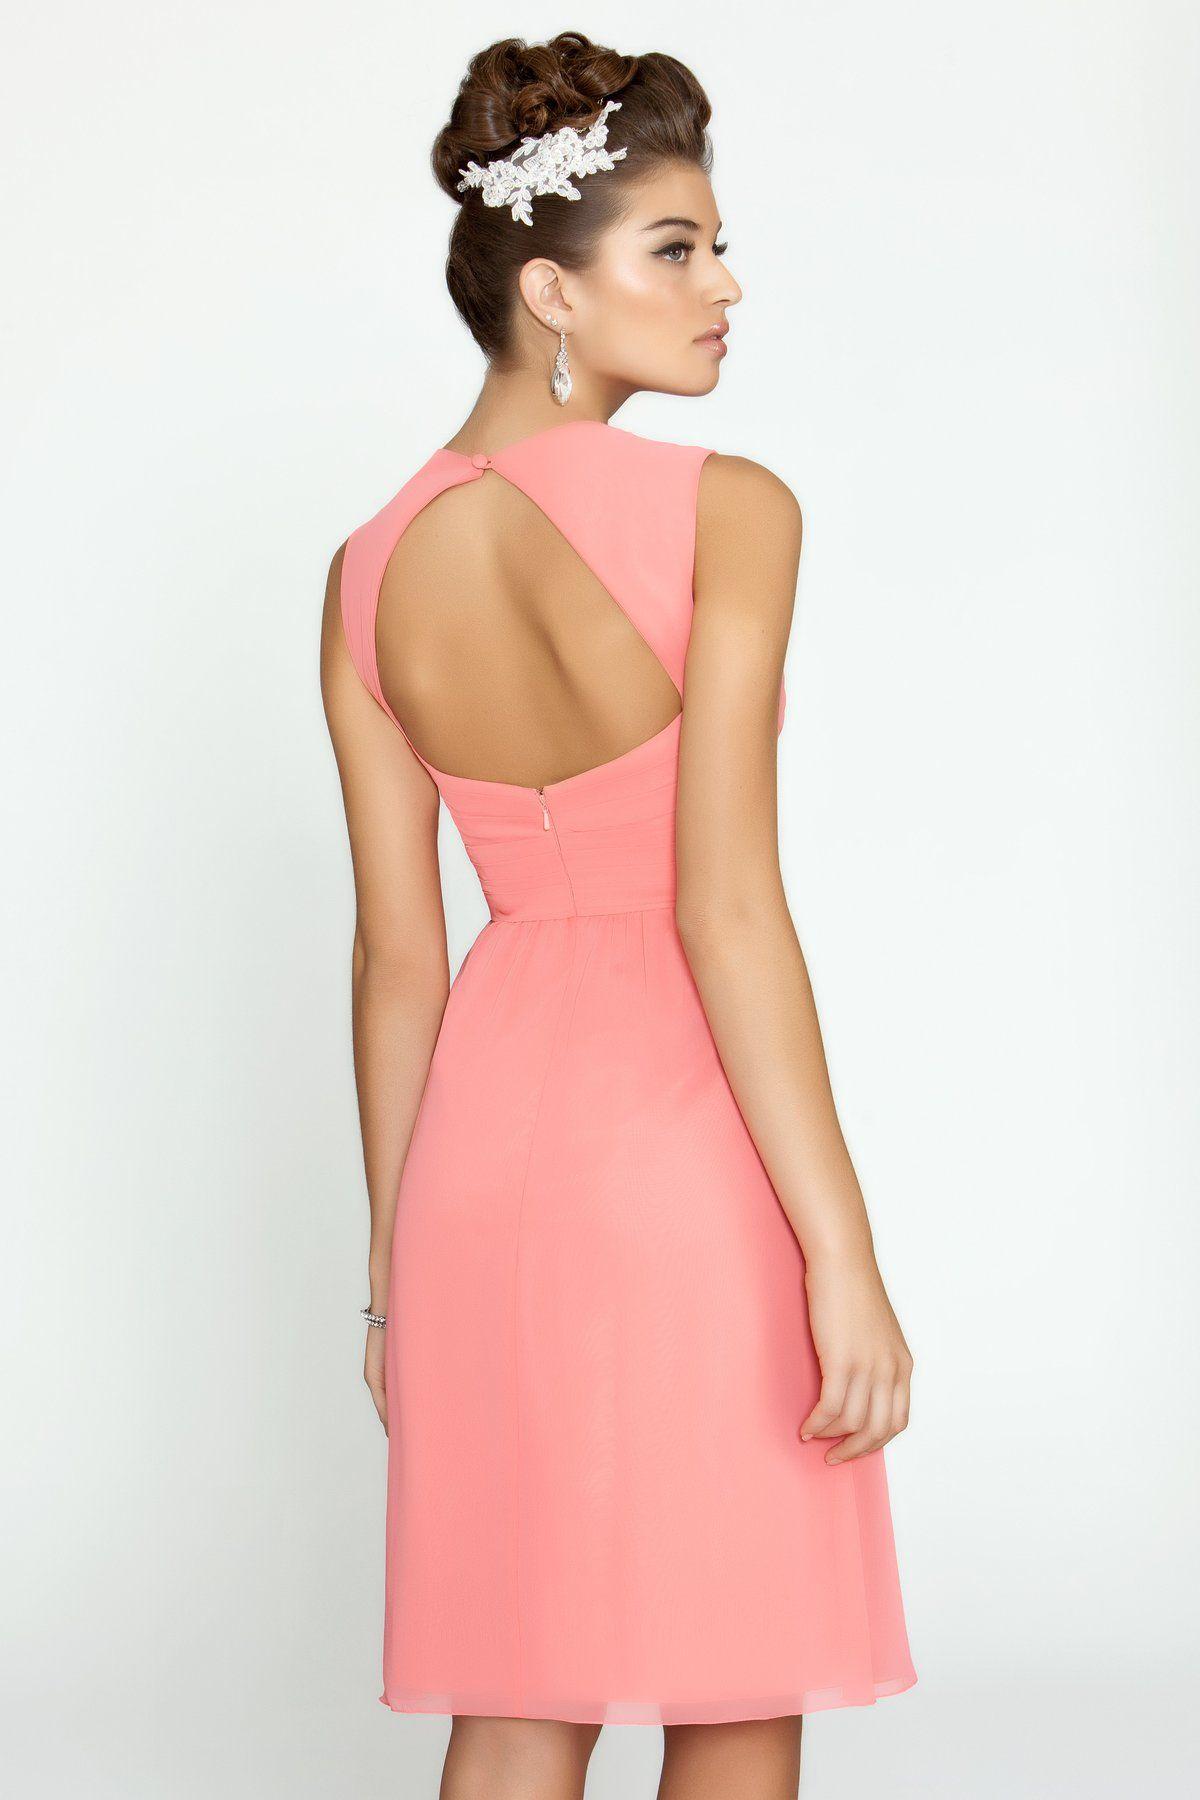 Alexia Designs style 148S: Bella chiffon bridesmaid dress with ...